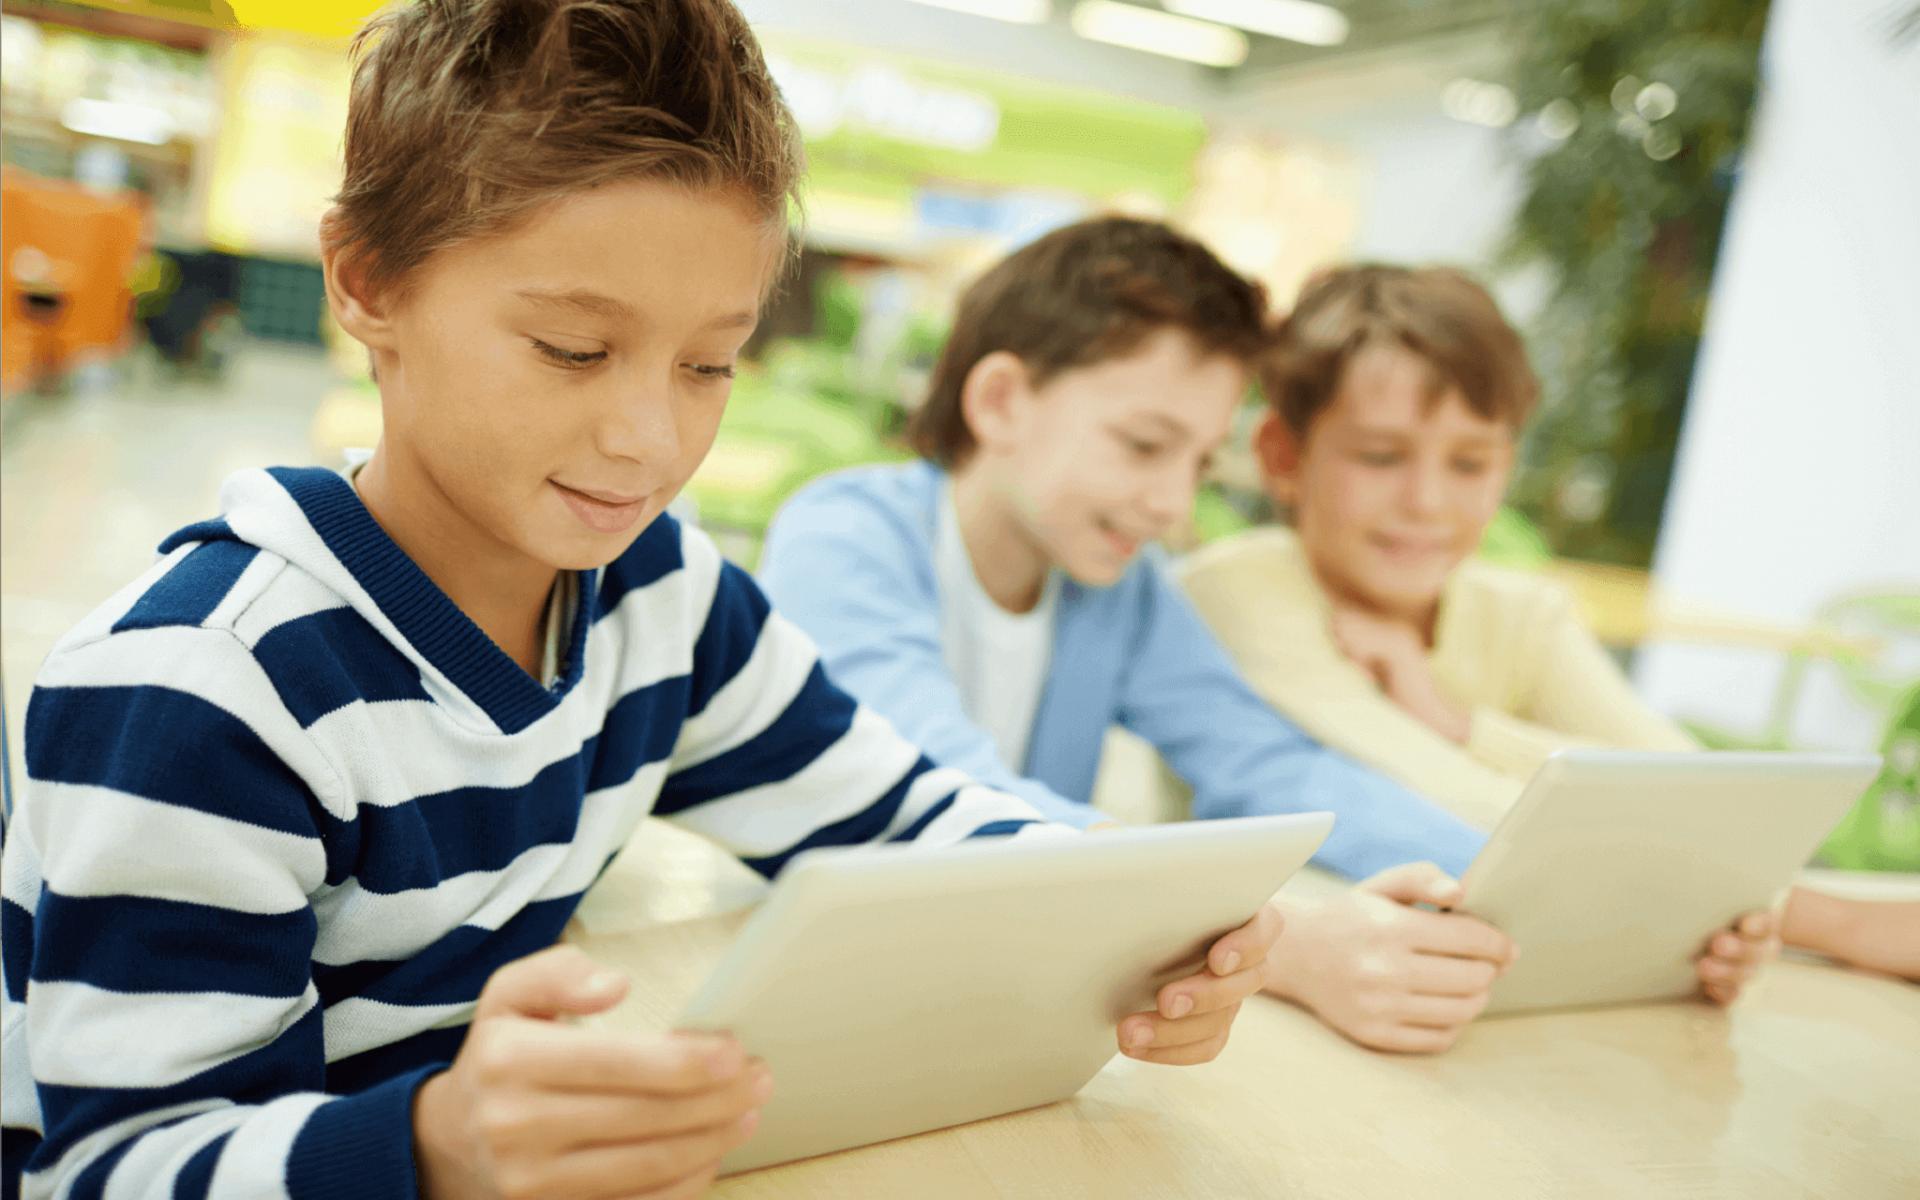 Samsung anuncia campanha para uso de tablet nos estudos 2